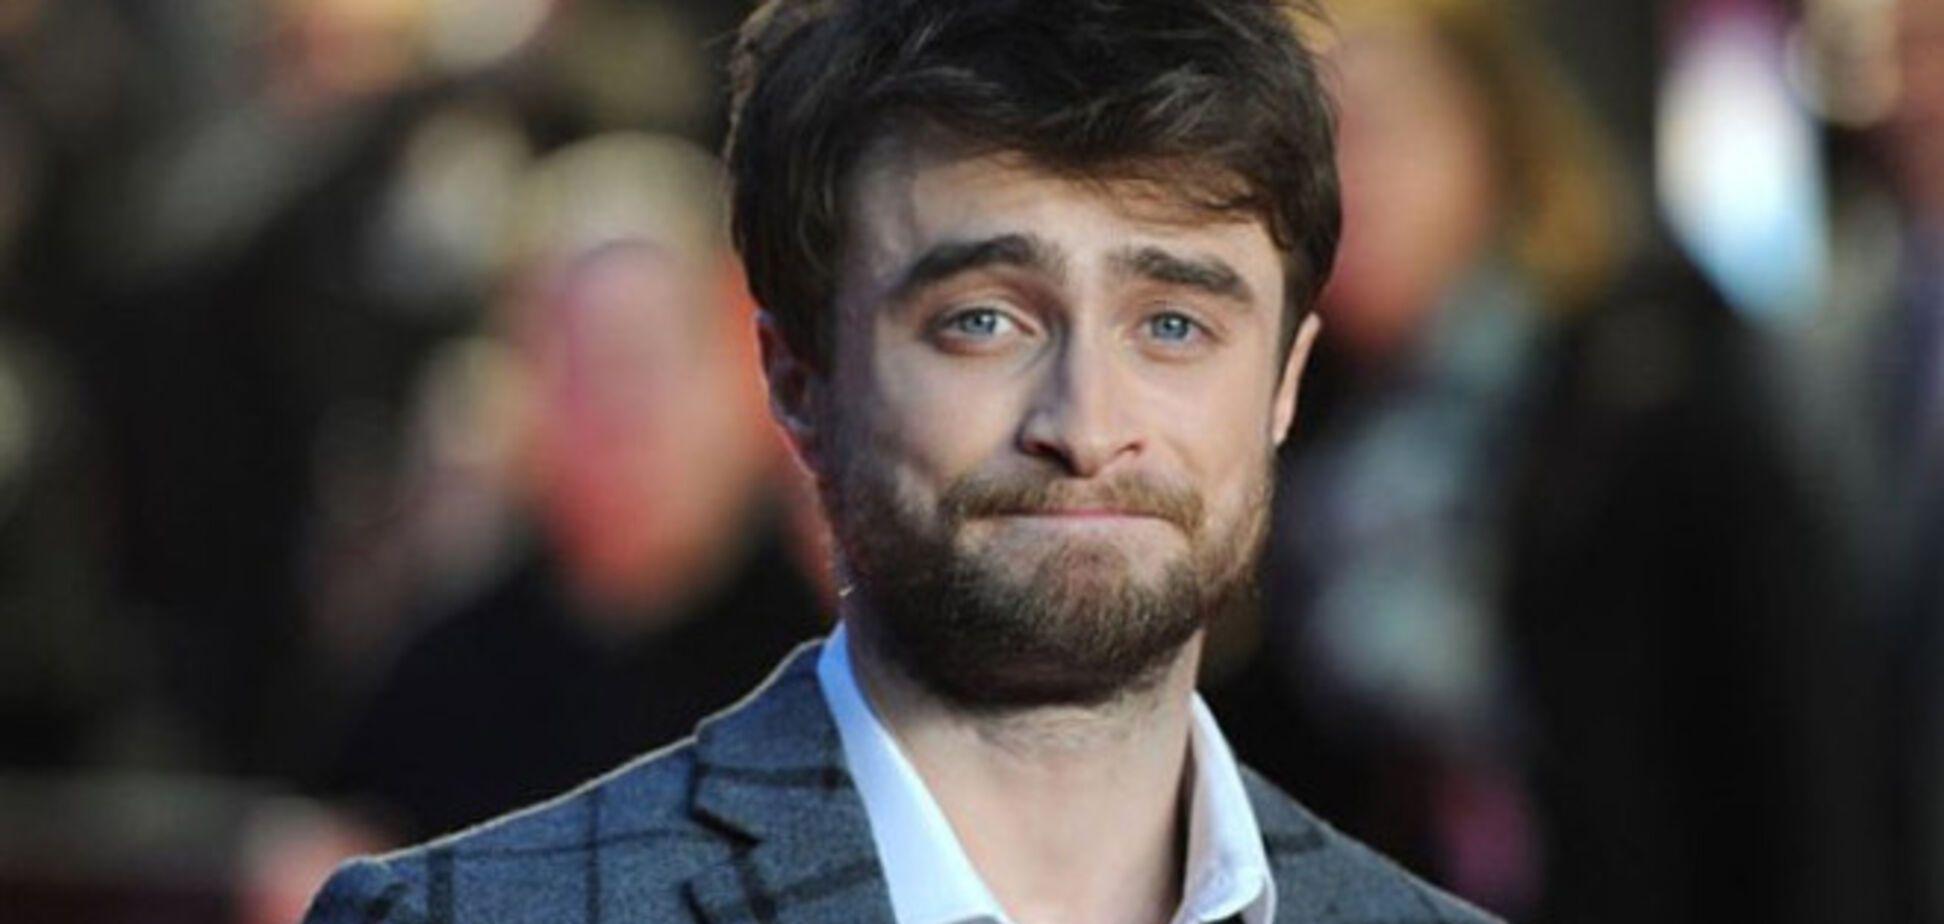 Актеры, которые ненавидят церемонию 'Оскар'